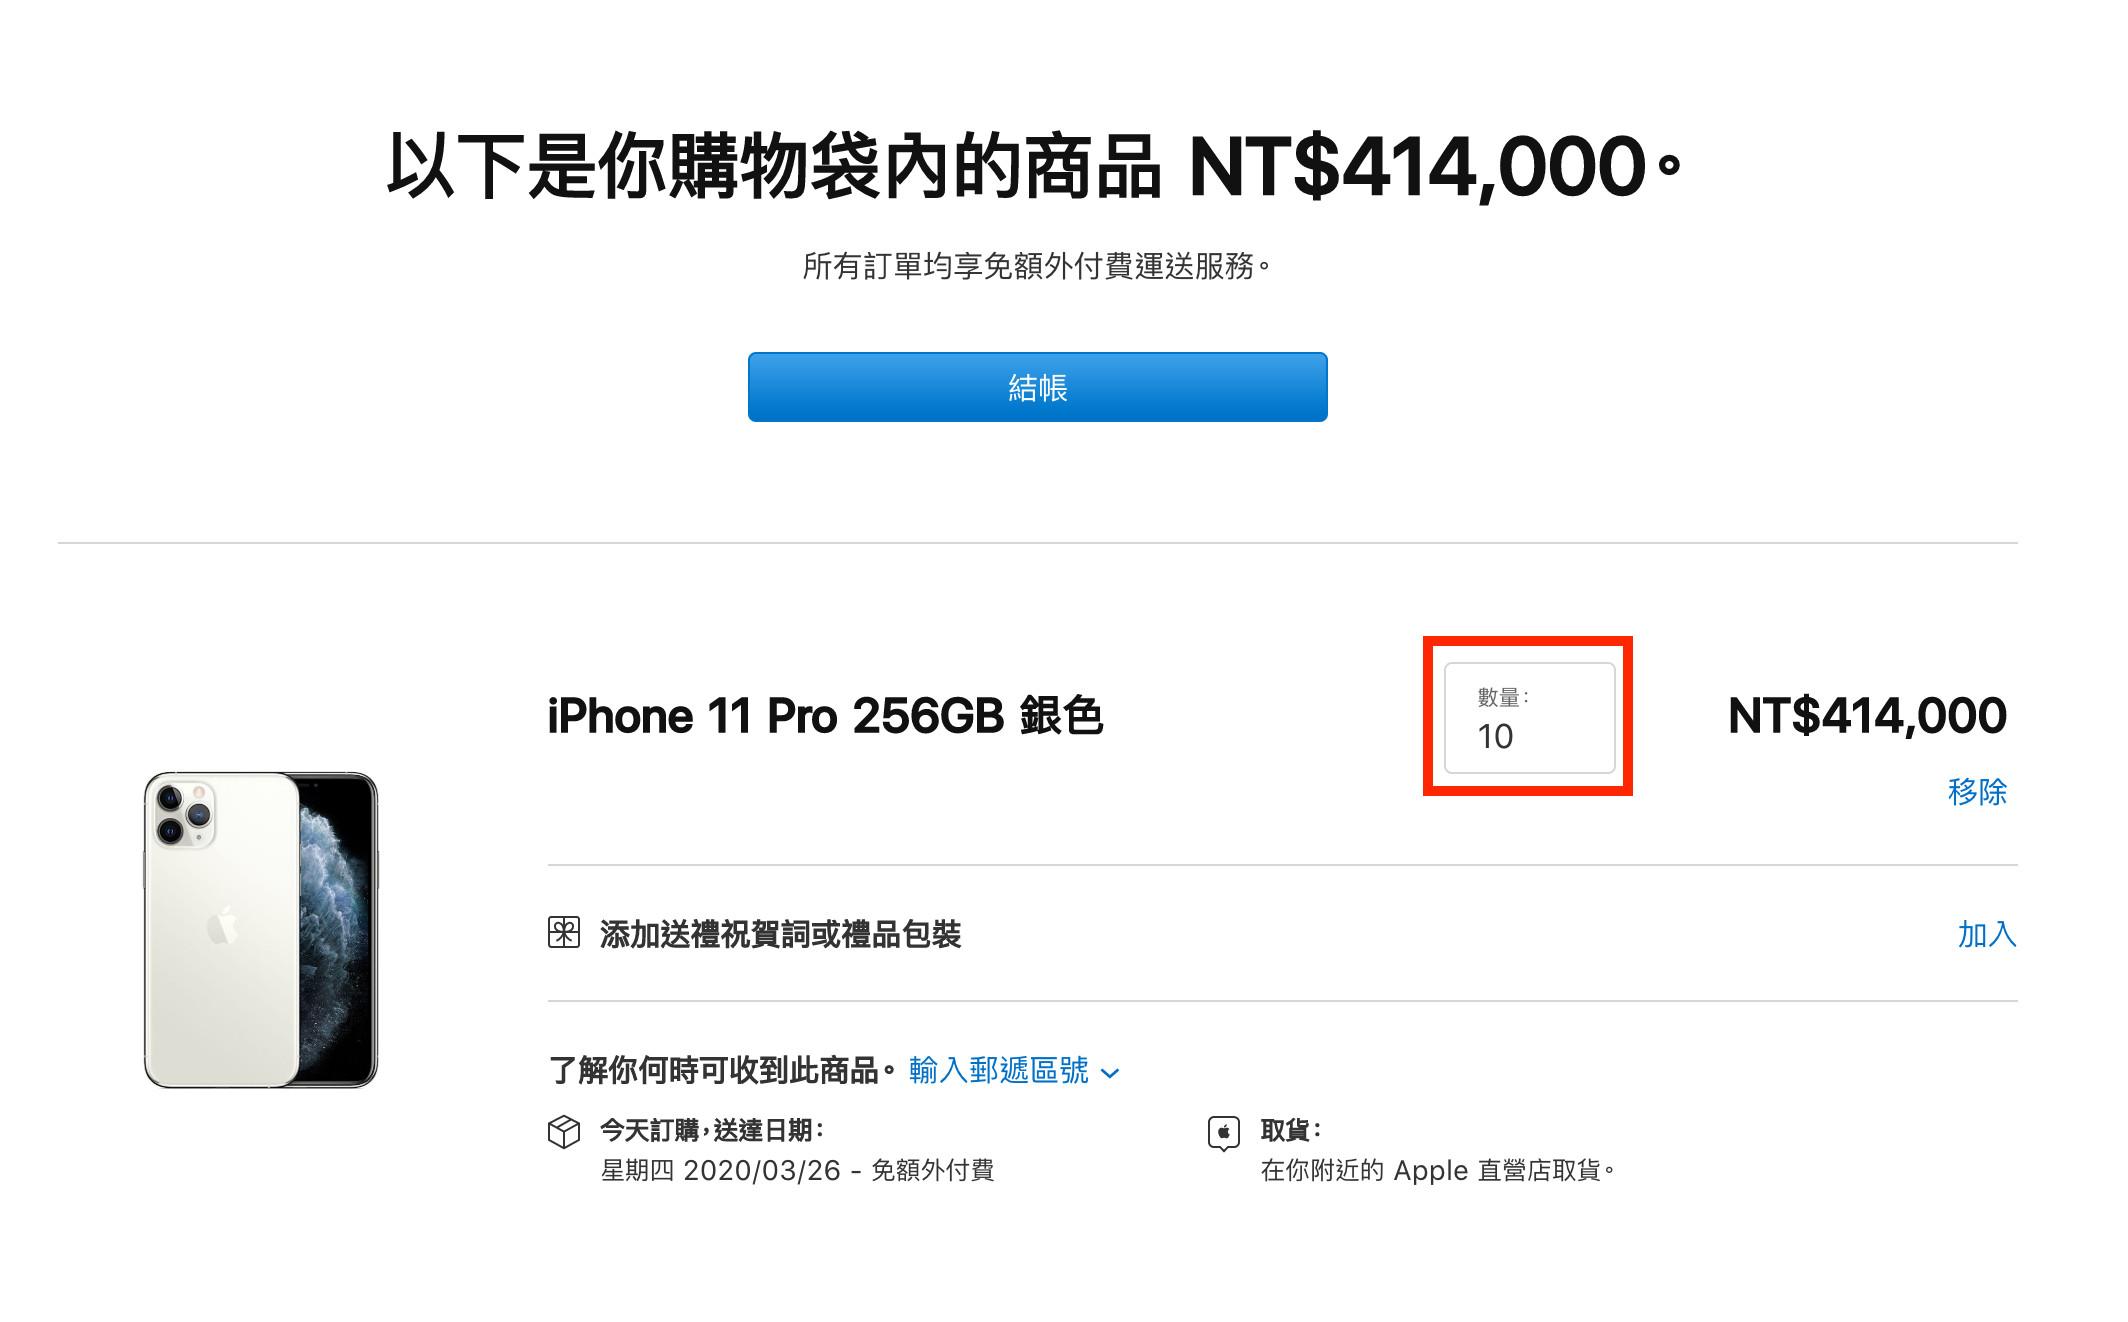 Ap.ple限購令解除 買10支以上iPhone沒問題